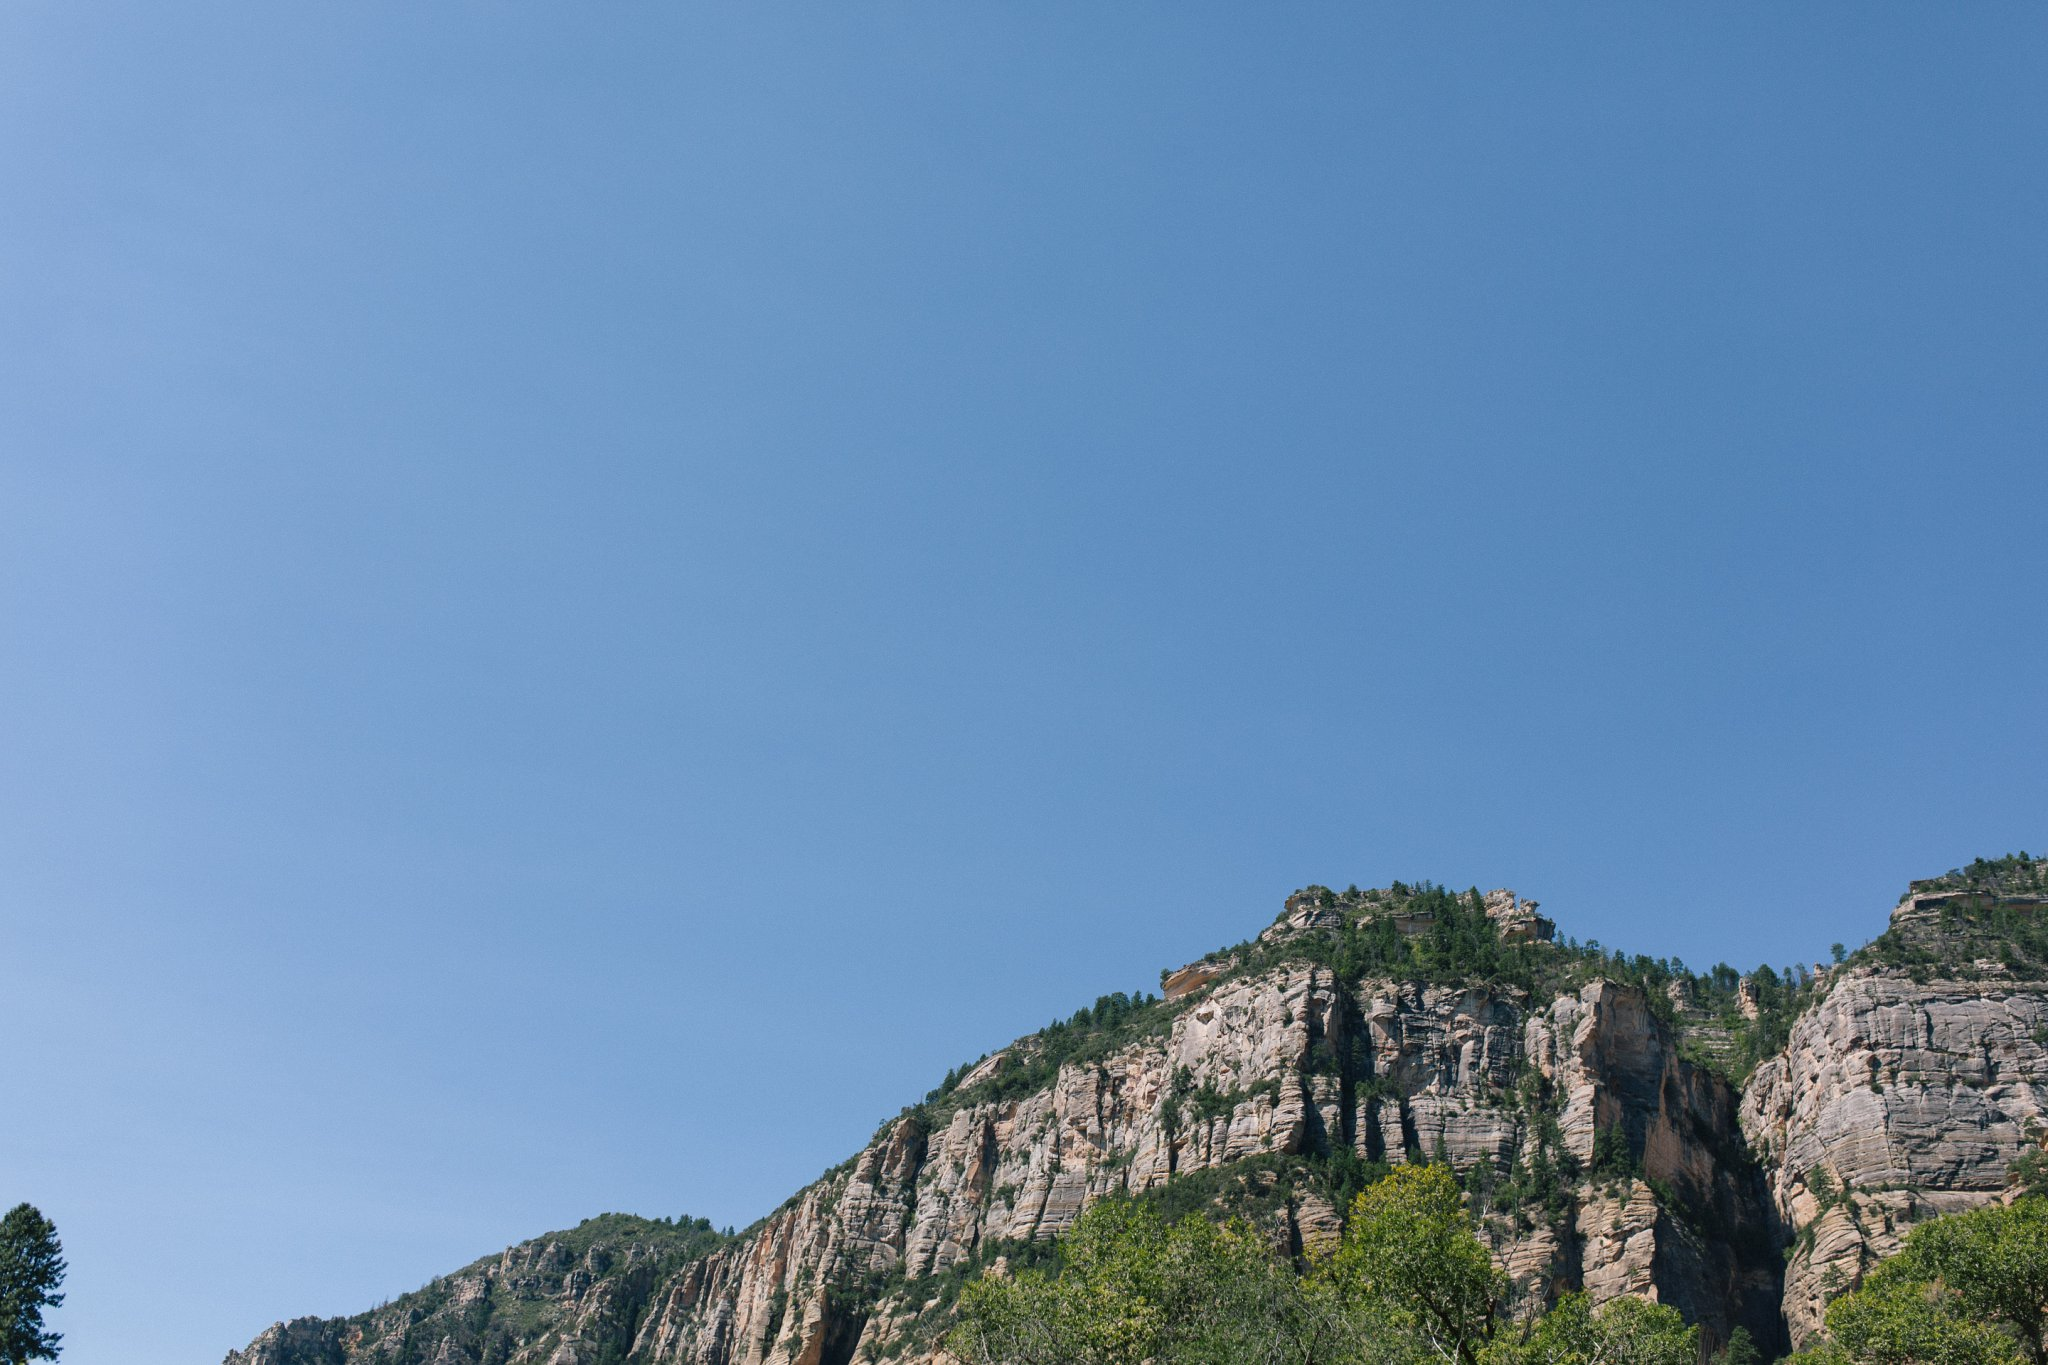 West Fork Trail Sedona